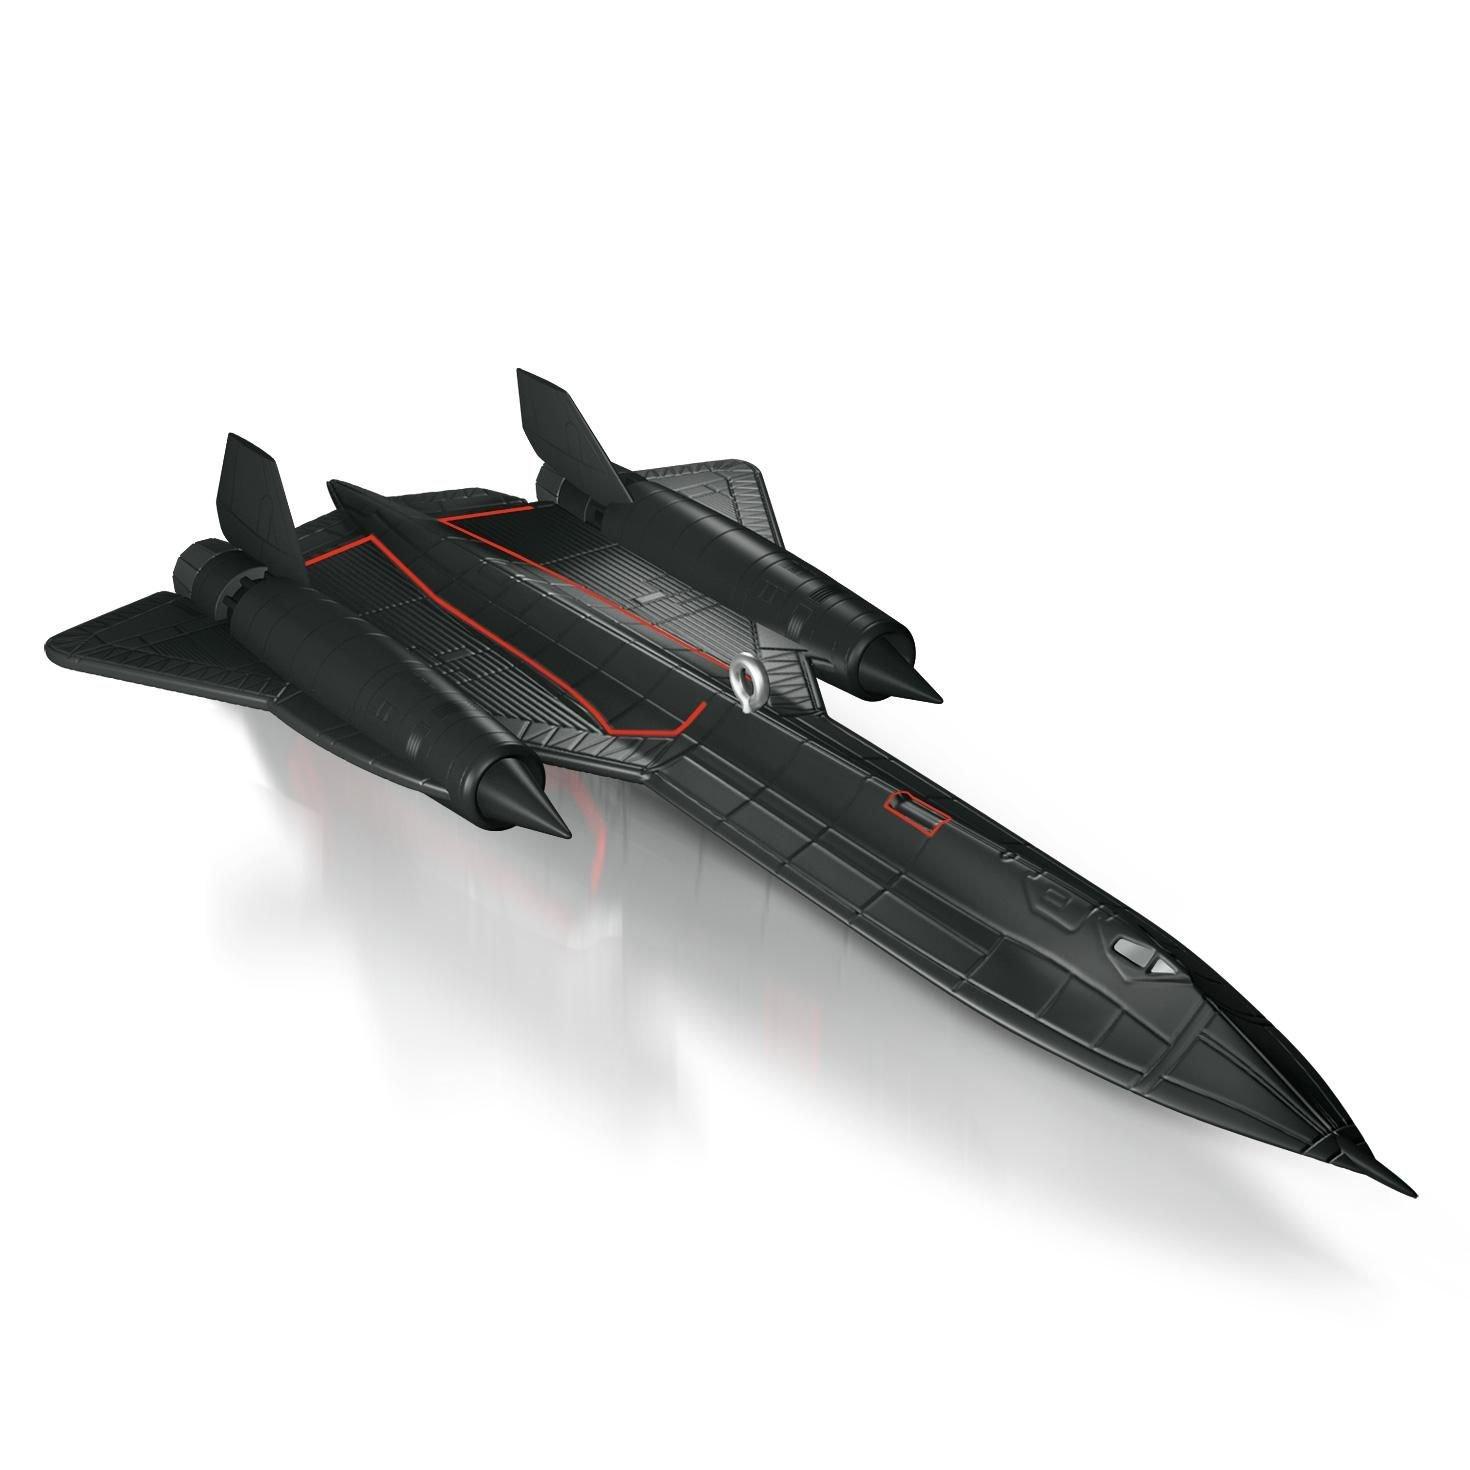 Amazon.com: Hallmark 2014 Lockheed SR-71 Blackbird Aircraft Ornament: Home  & Kitchen